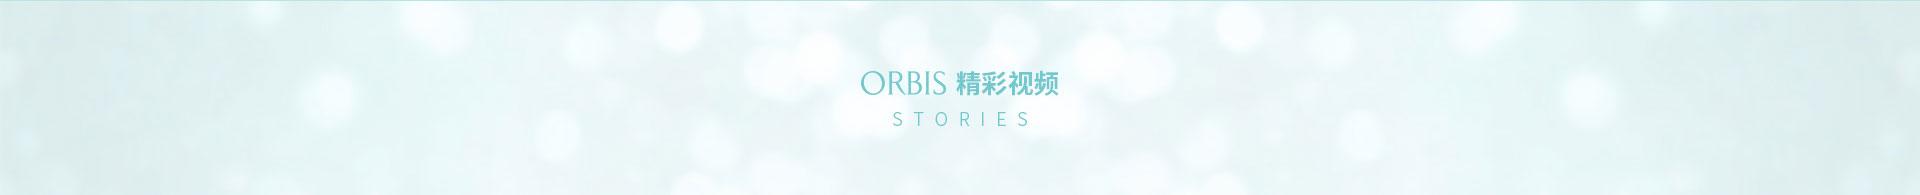 ORBIS奥蜜思视频